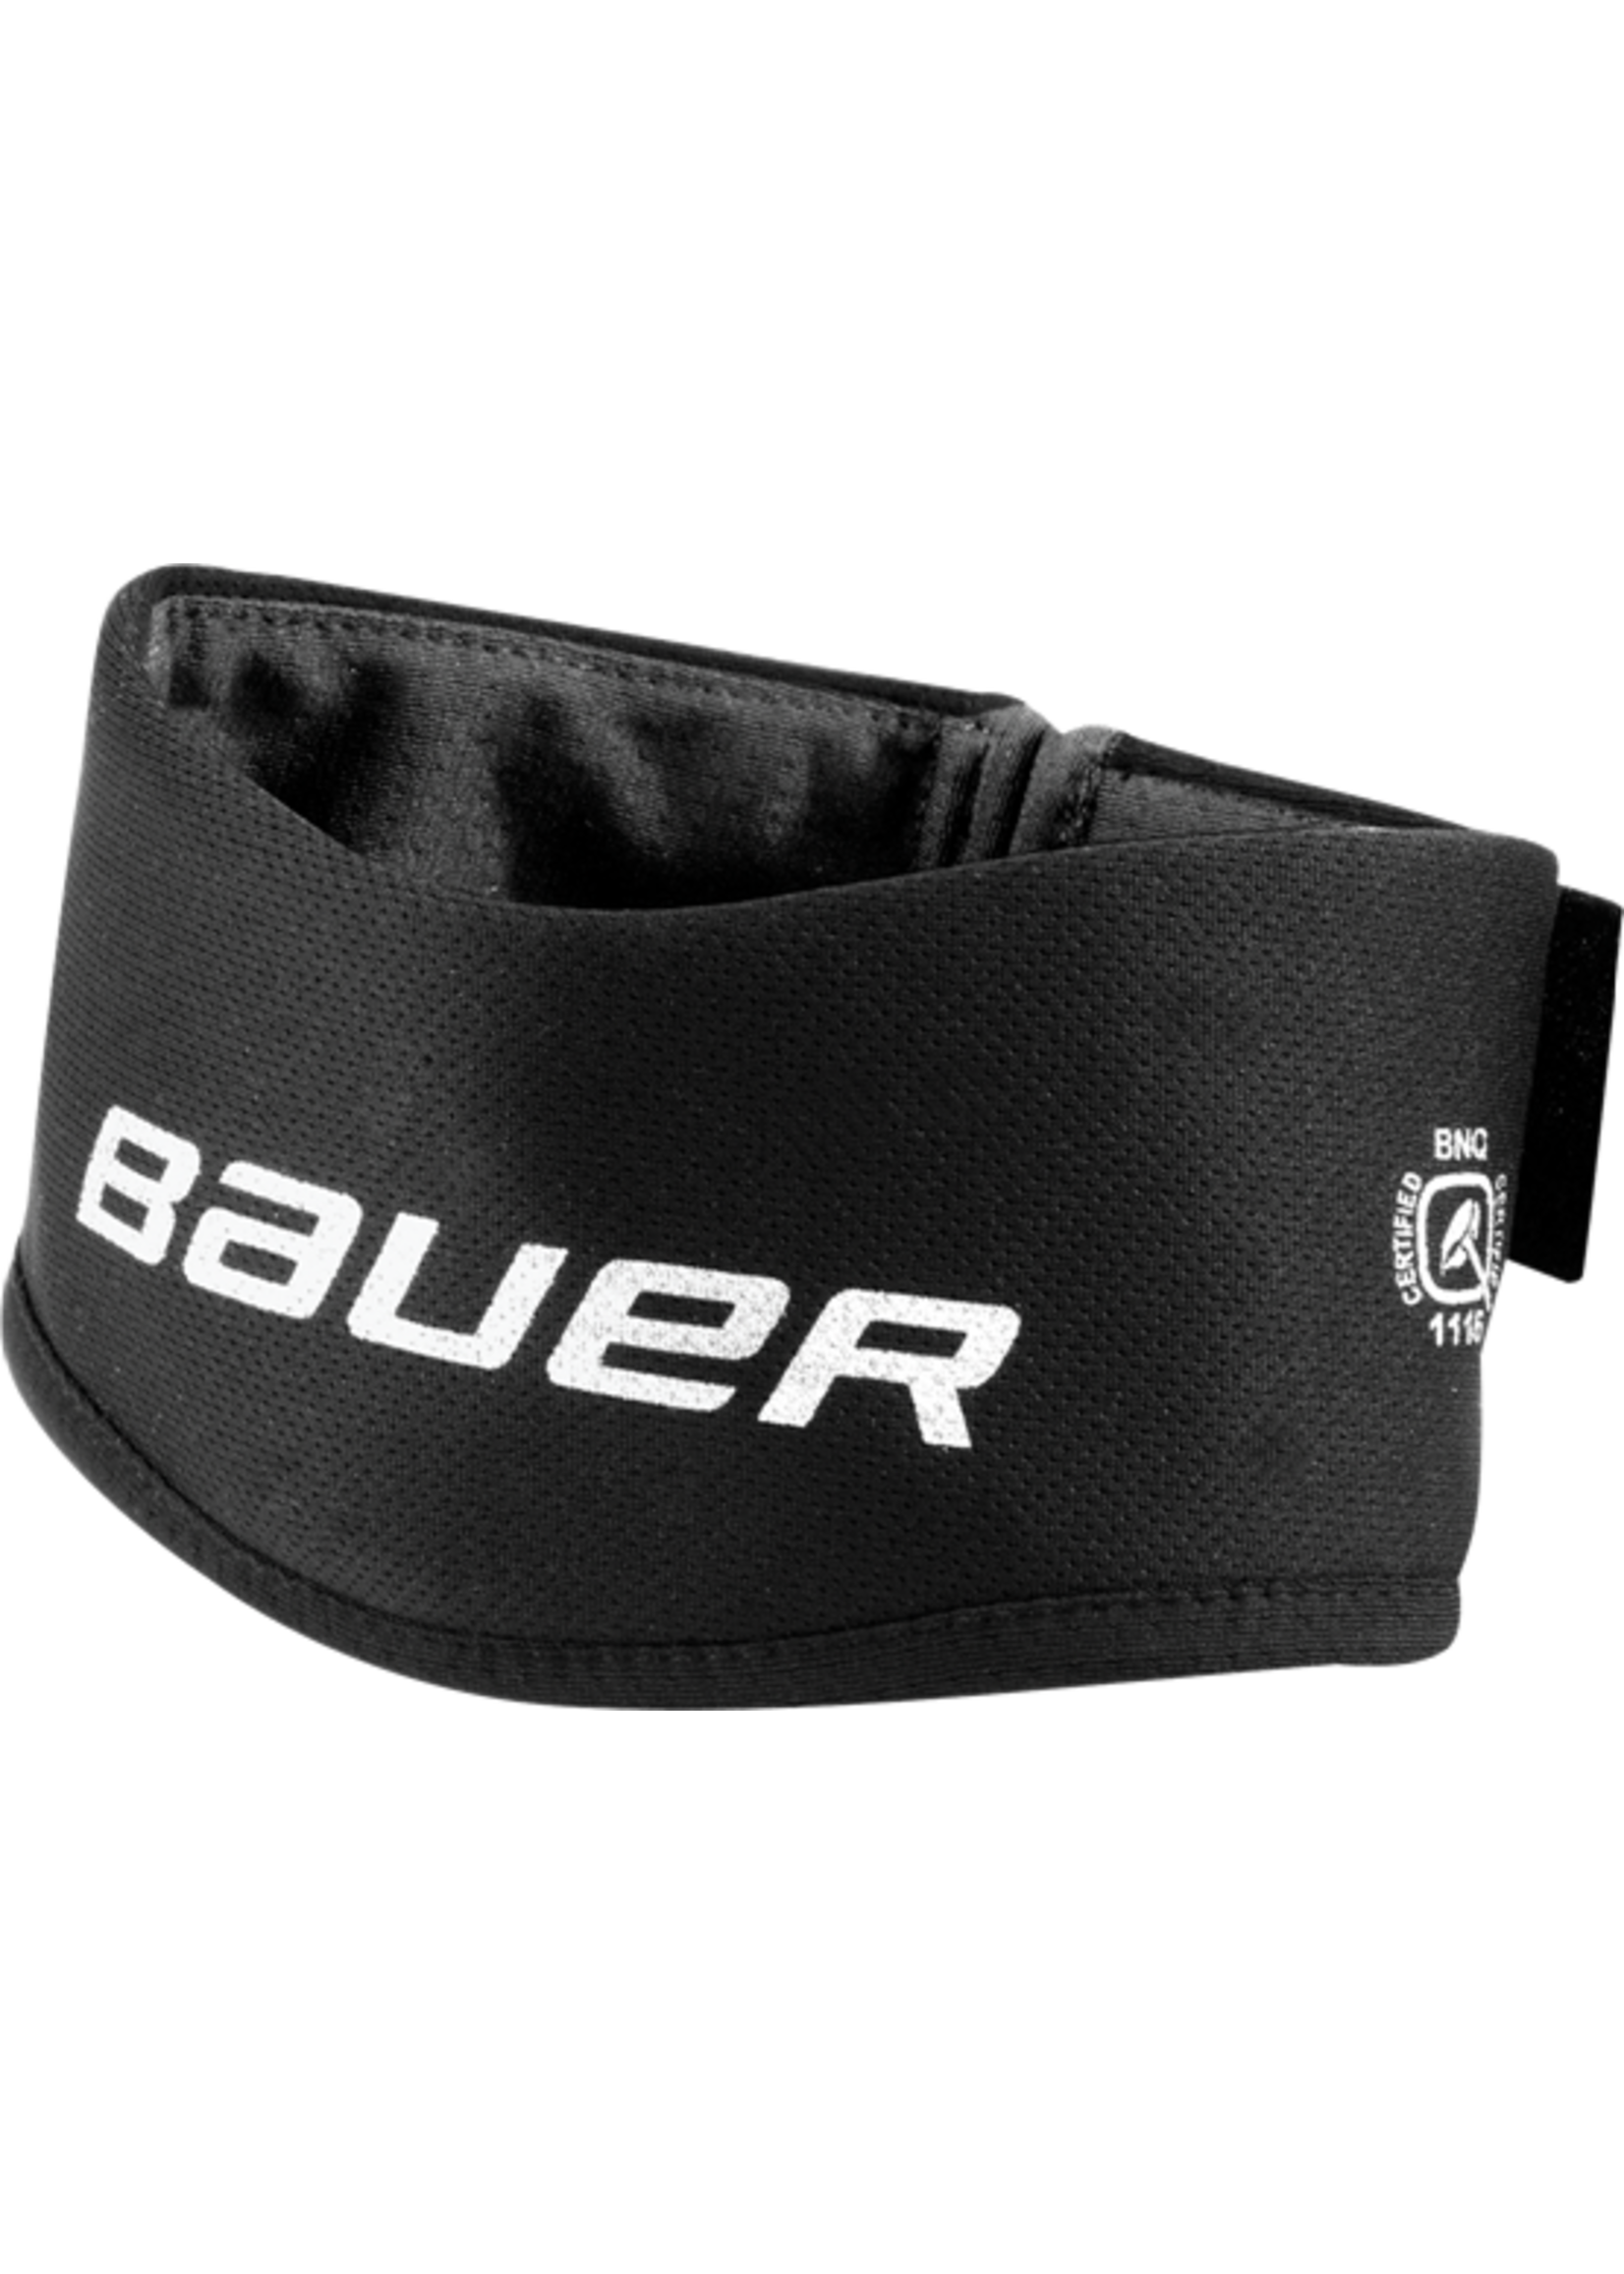 Bauer Hockey - Canada BAUER NG NLP20 PREM NECKGUARD COLLAR SR-BLK BLK